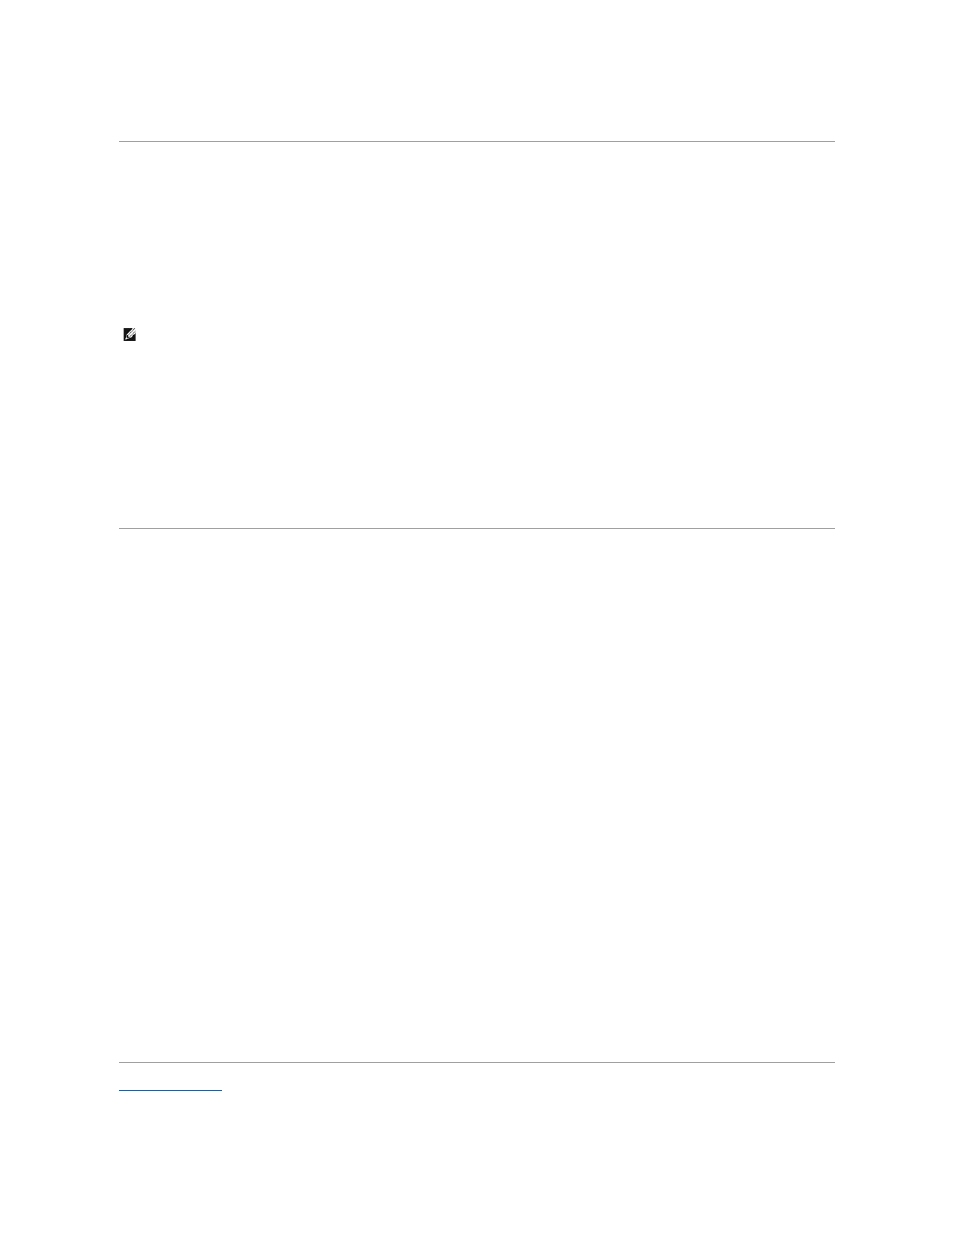 Baseboard management controller configuration, Idrac configuration